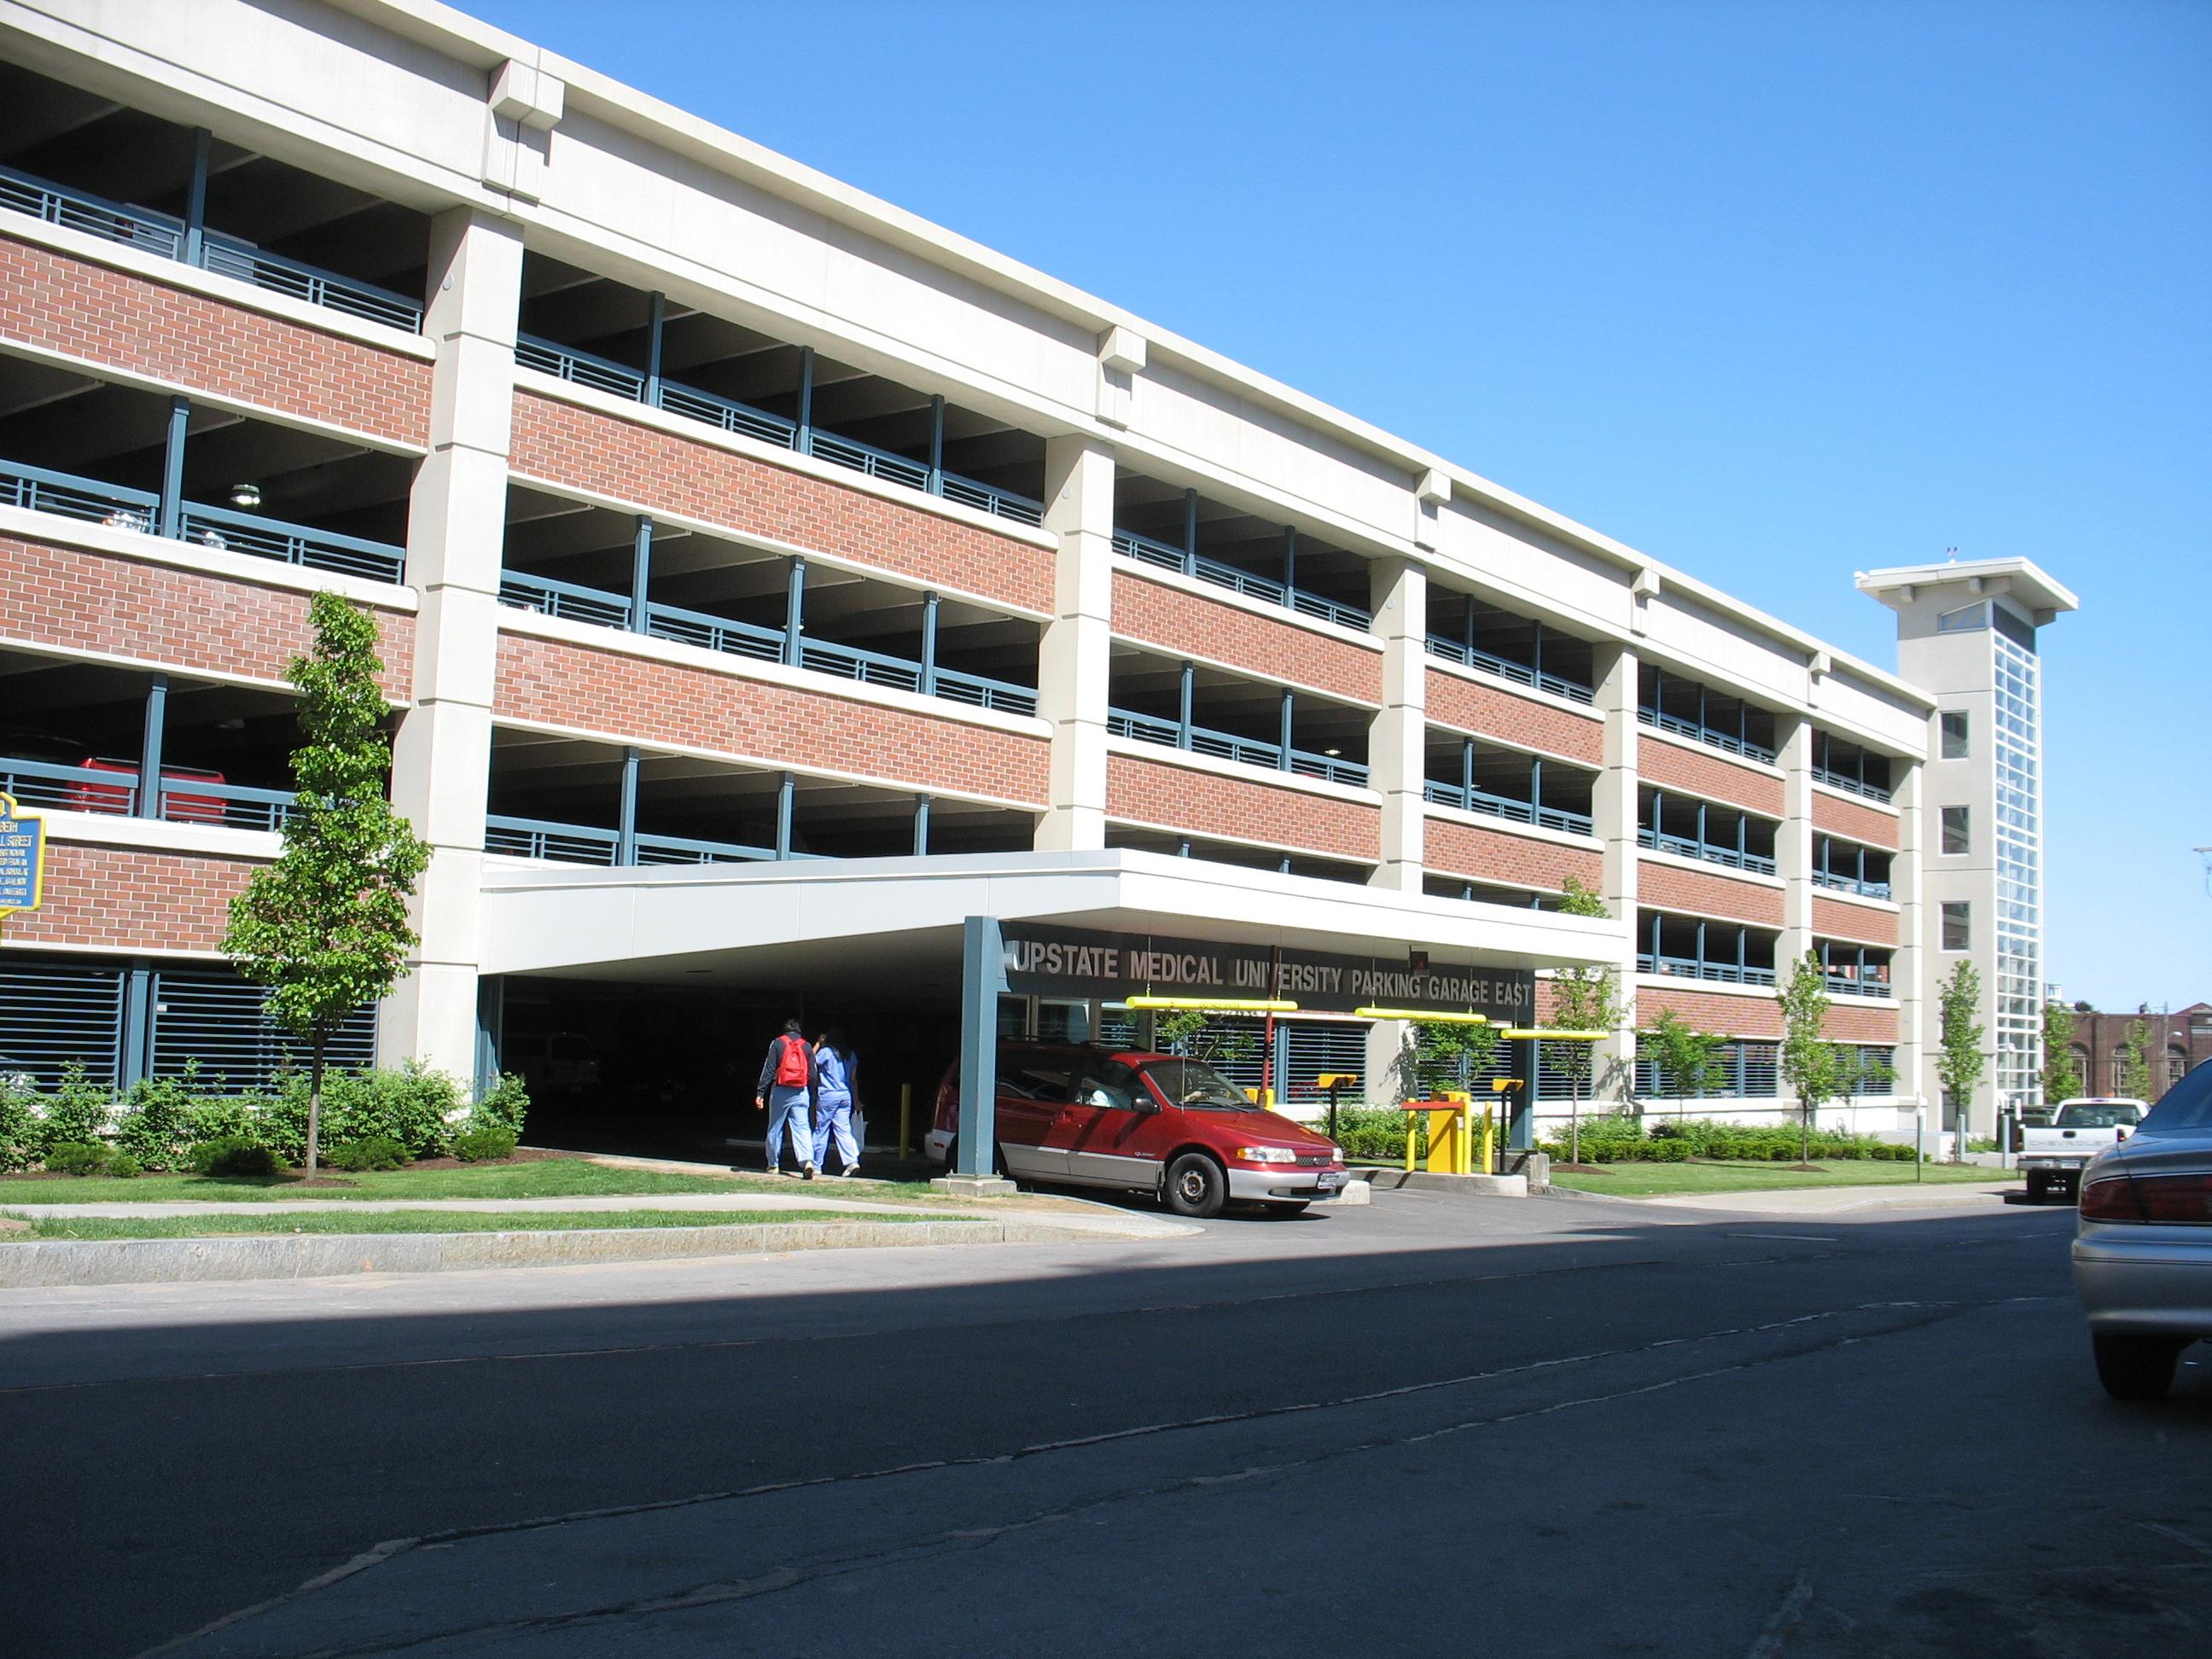 John P. Stopen SUNY Upstate Parking Garage entrance